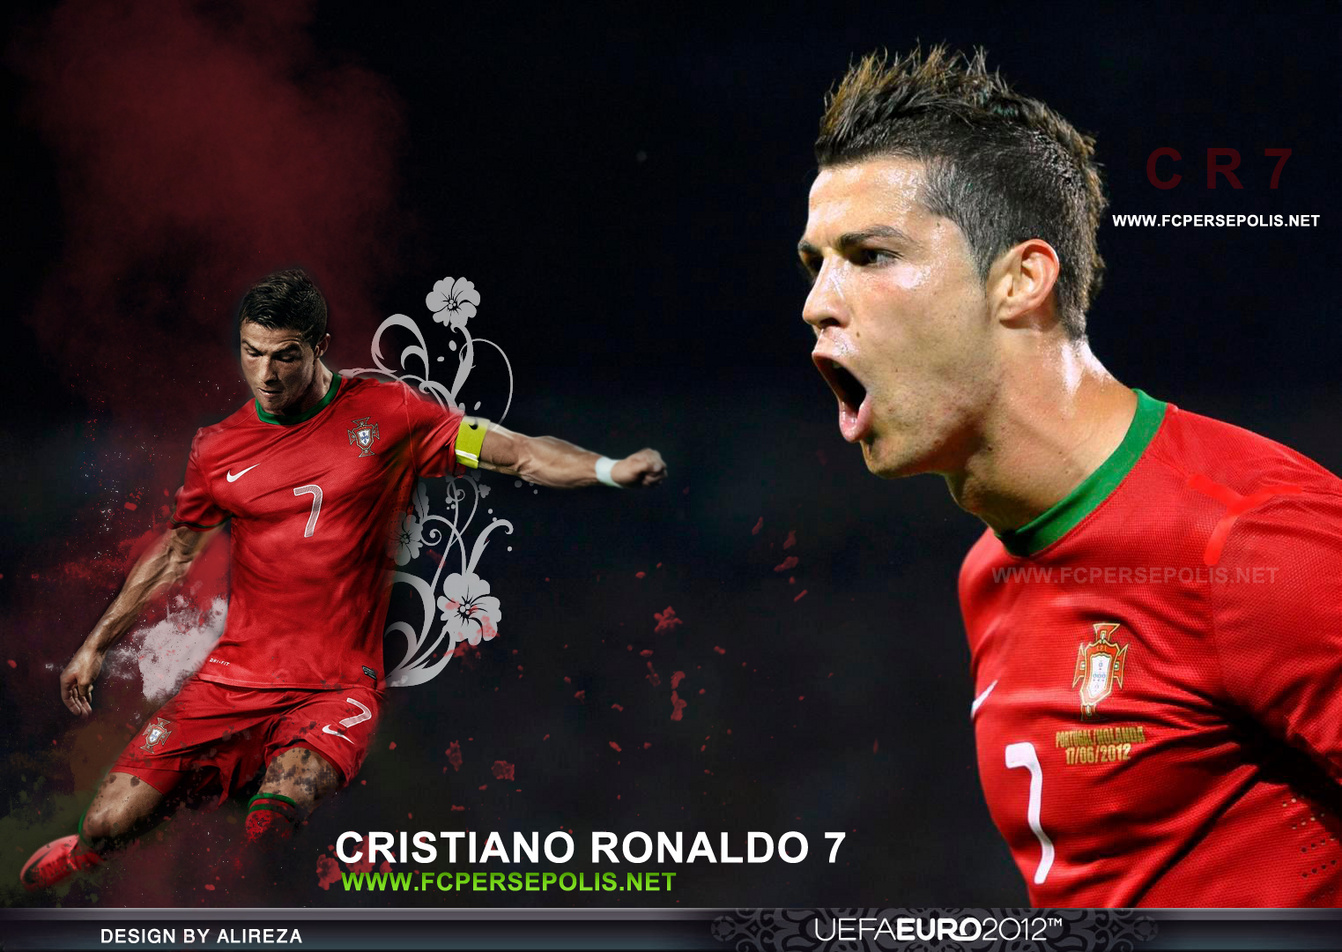 http://4.bp.blogspot.com/-QpojOTrXd9k/UQLyGOVe7gI/AAAAAAAAGMI/HKYRqVbmpZI/s1600/Cristiano-Ronaldo-Portugal-Wallpaper+fondo+de+escritorio.jpg